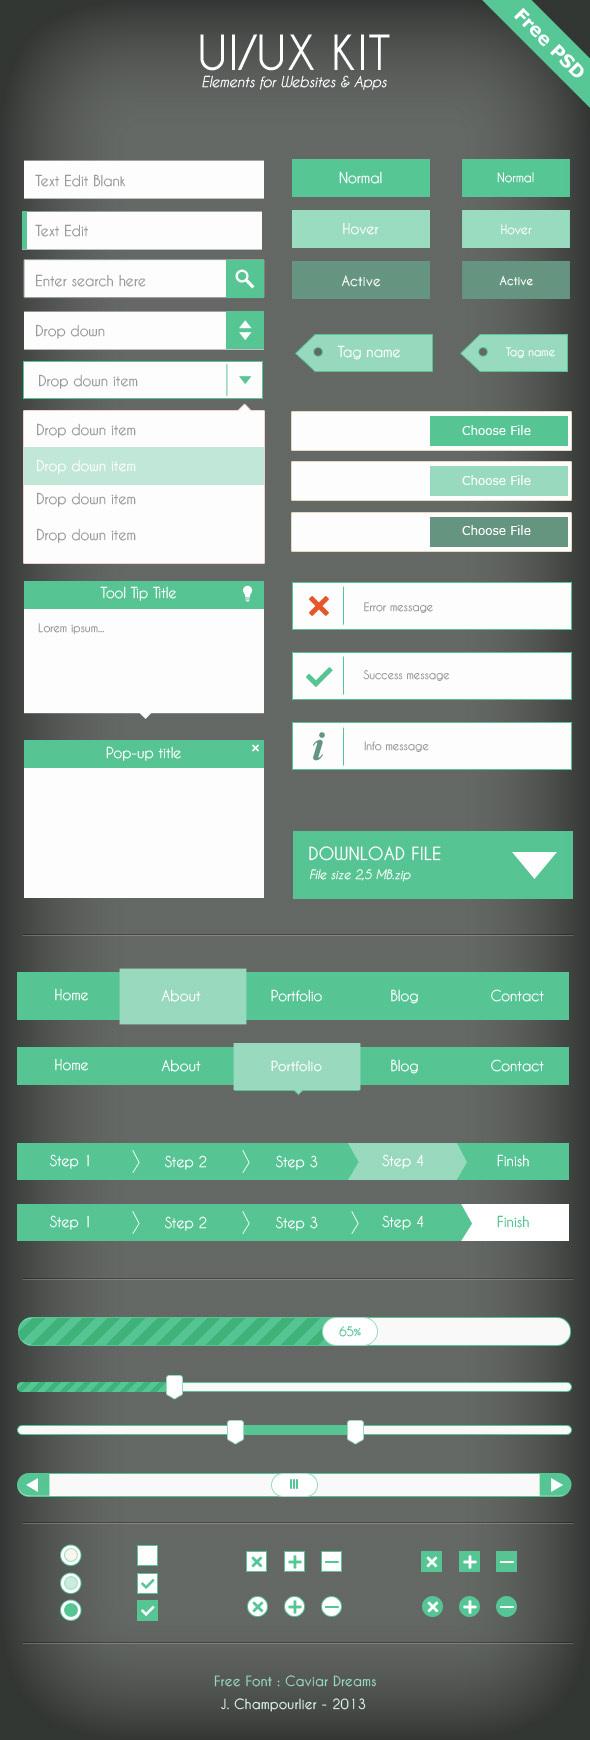 UI UX Kit Elements For Website & APP (PSD) 1